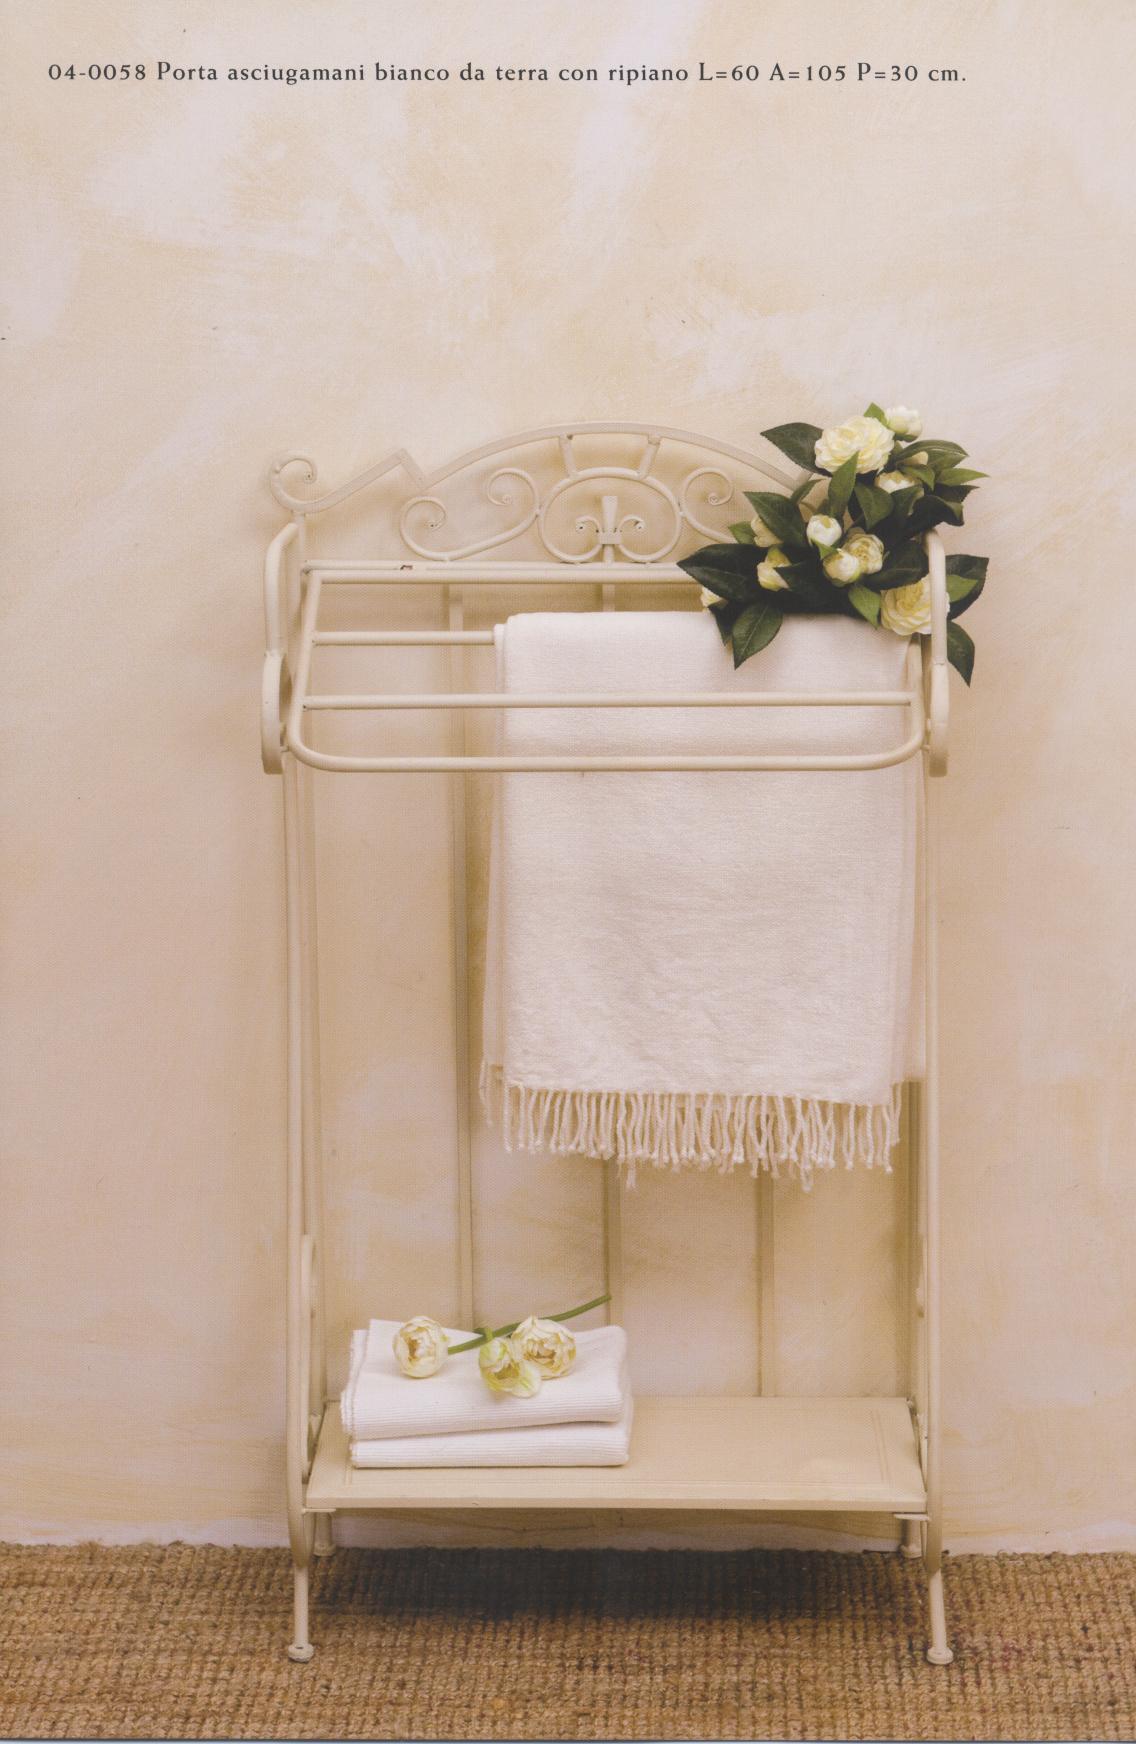 Tavolini nuovarredo - Mobili porta asciugamani bagno ...